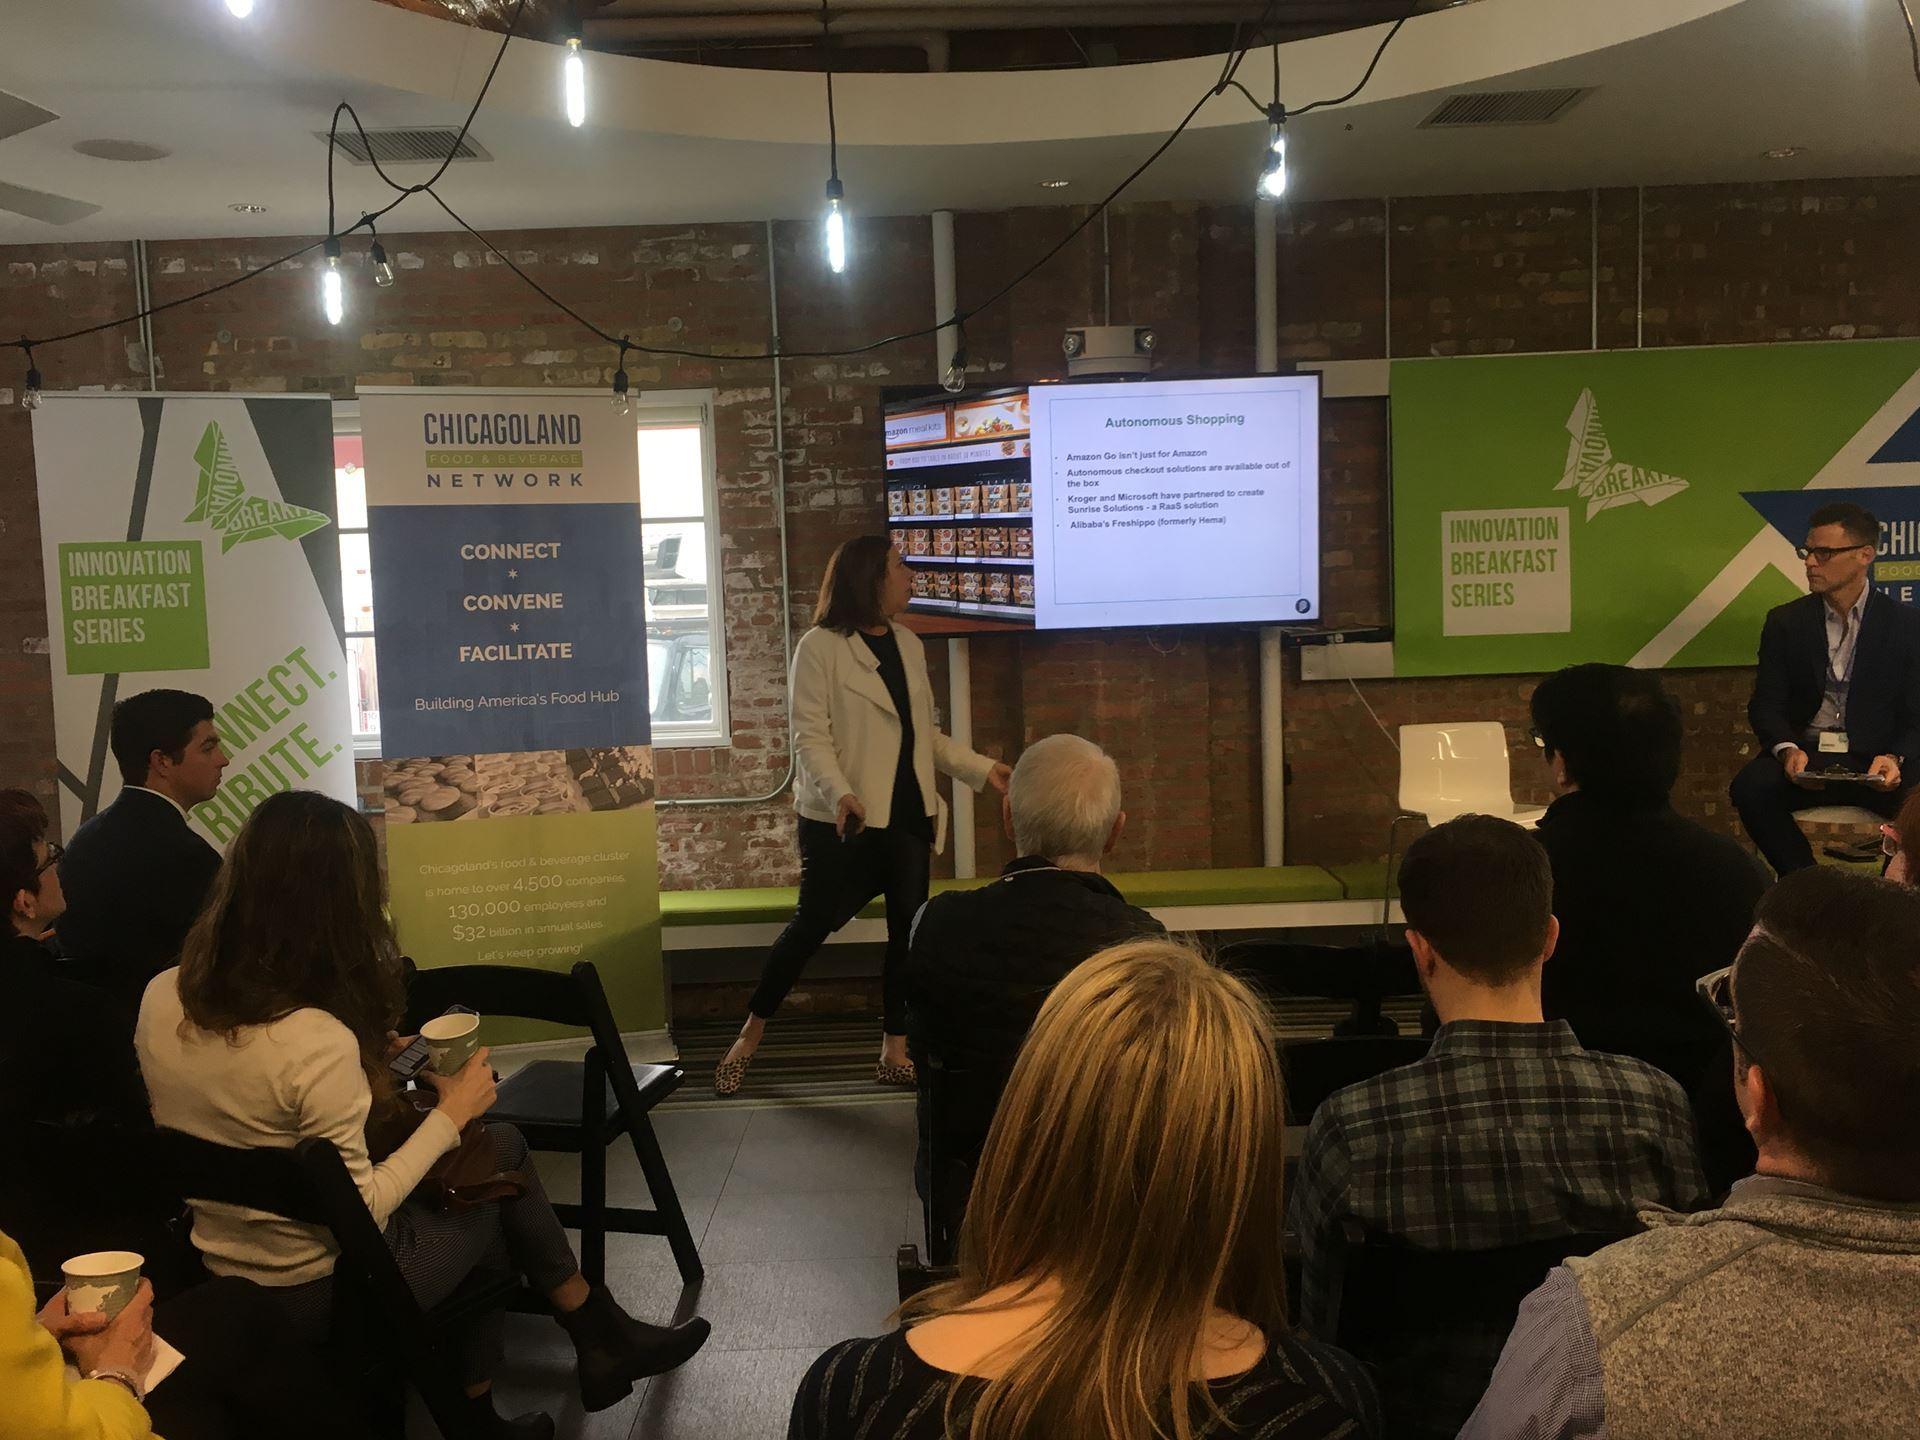 Chicagoland Food & Beverage Network - April Innovation Breakfast Recap